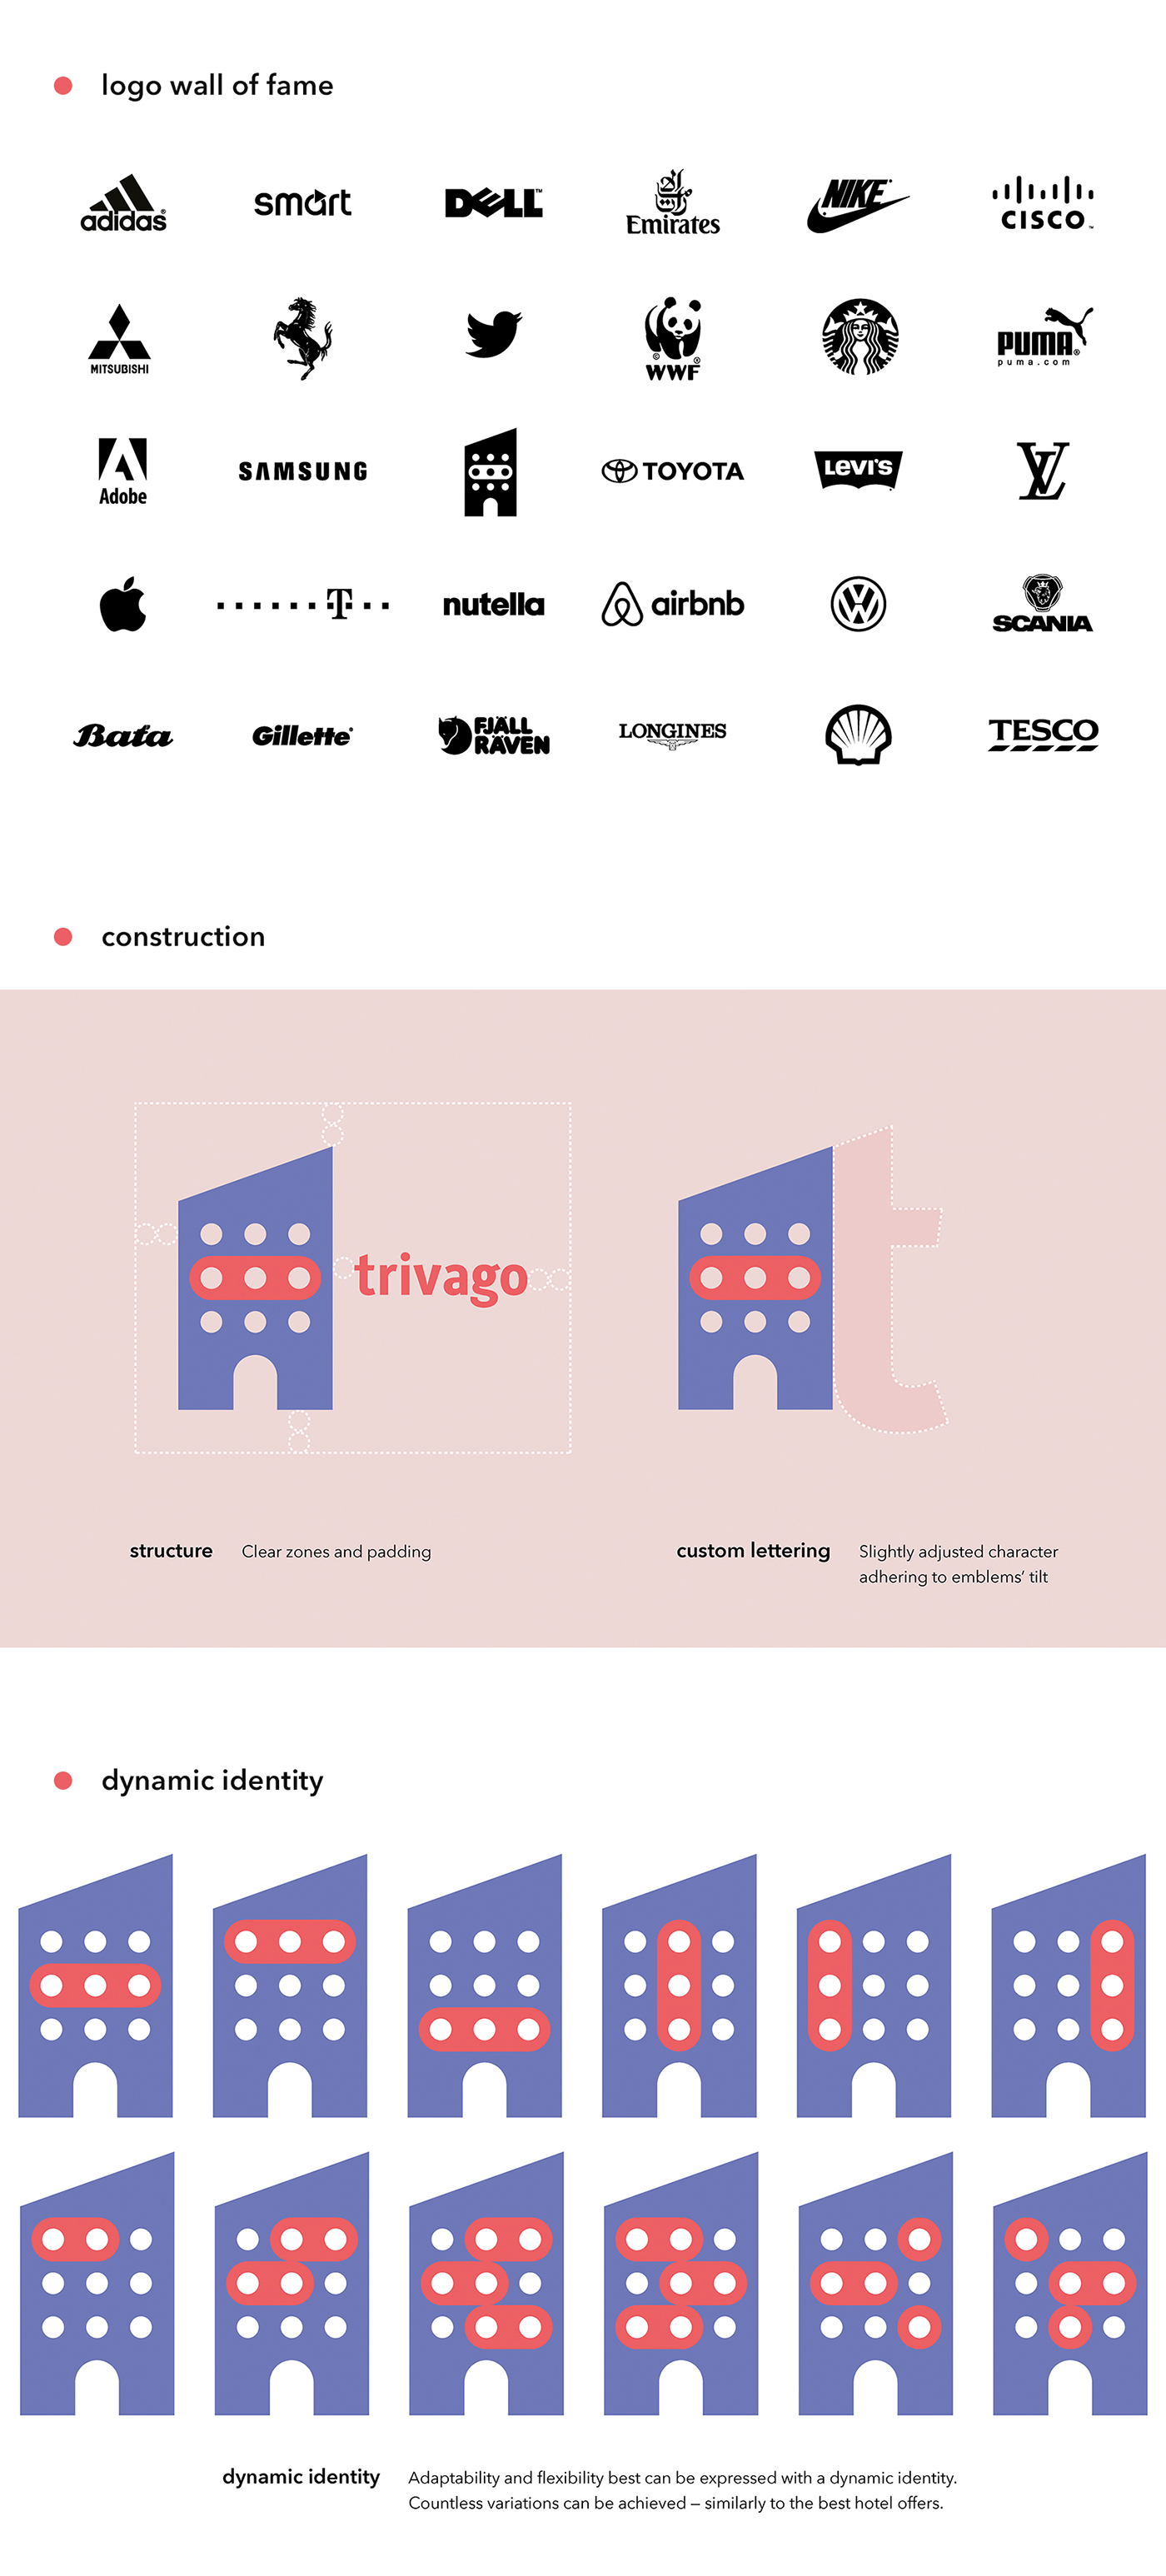 trivago rebranding case study on Behance